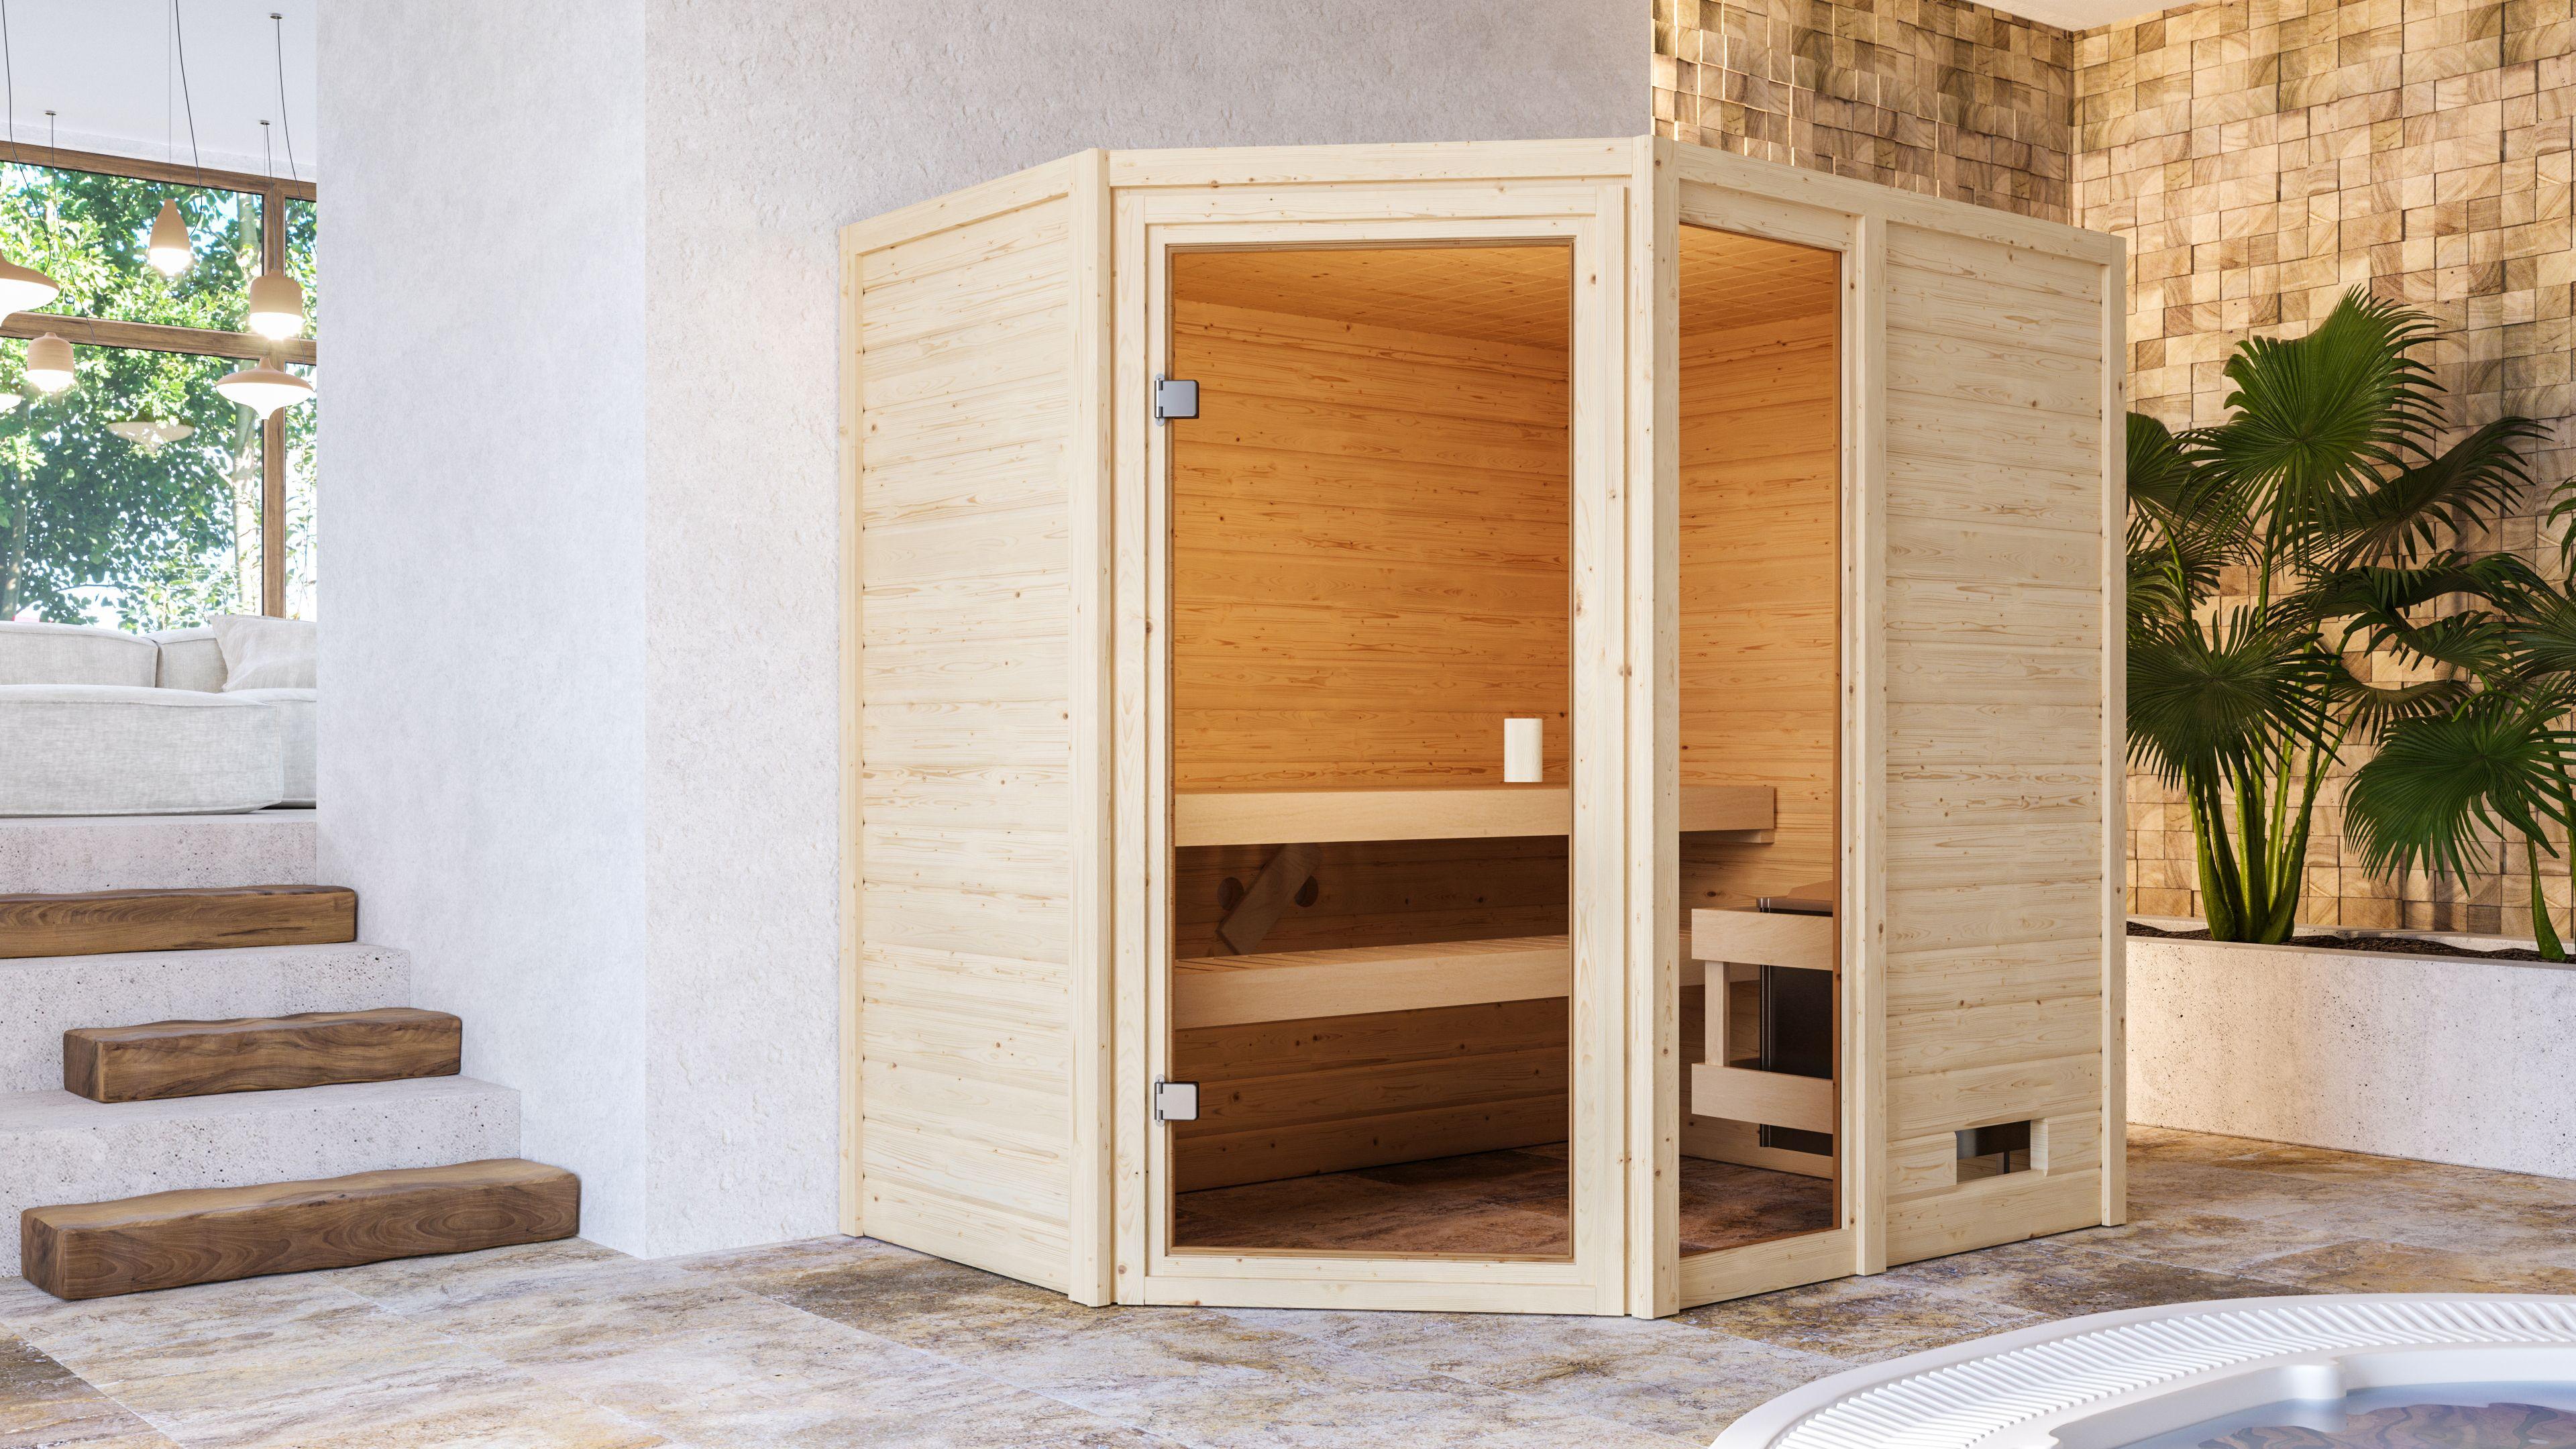 Woodfeeling Sauna Jada 38mm Saunaofen 9 kW intern Bild 10